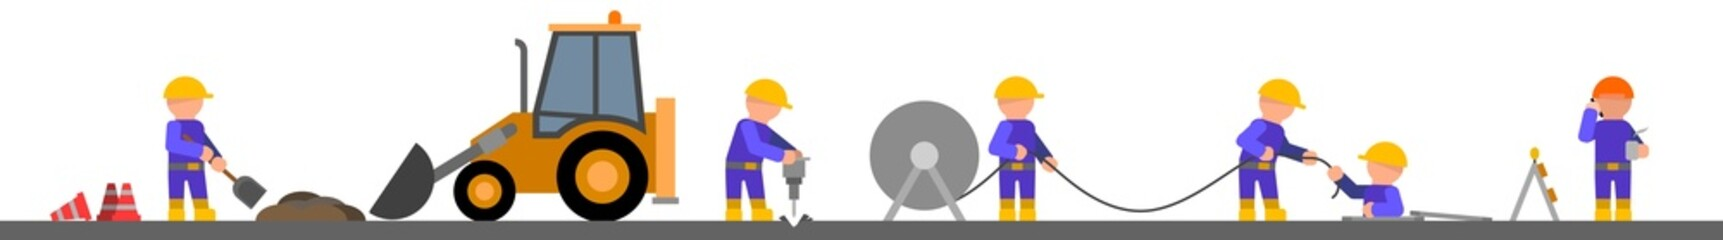 Road works - vector illustration on white background